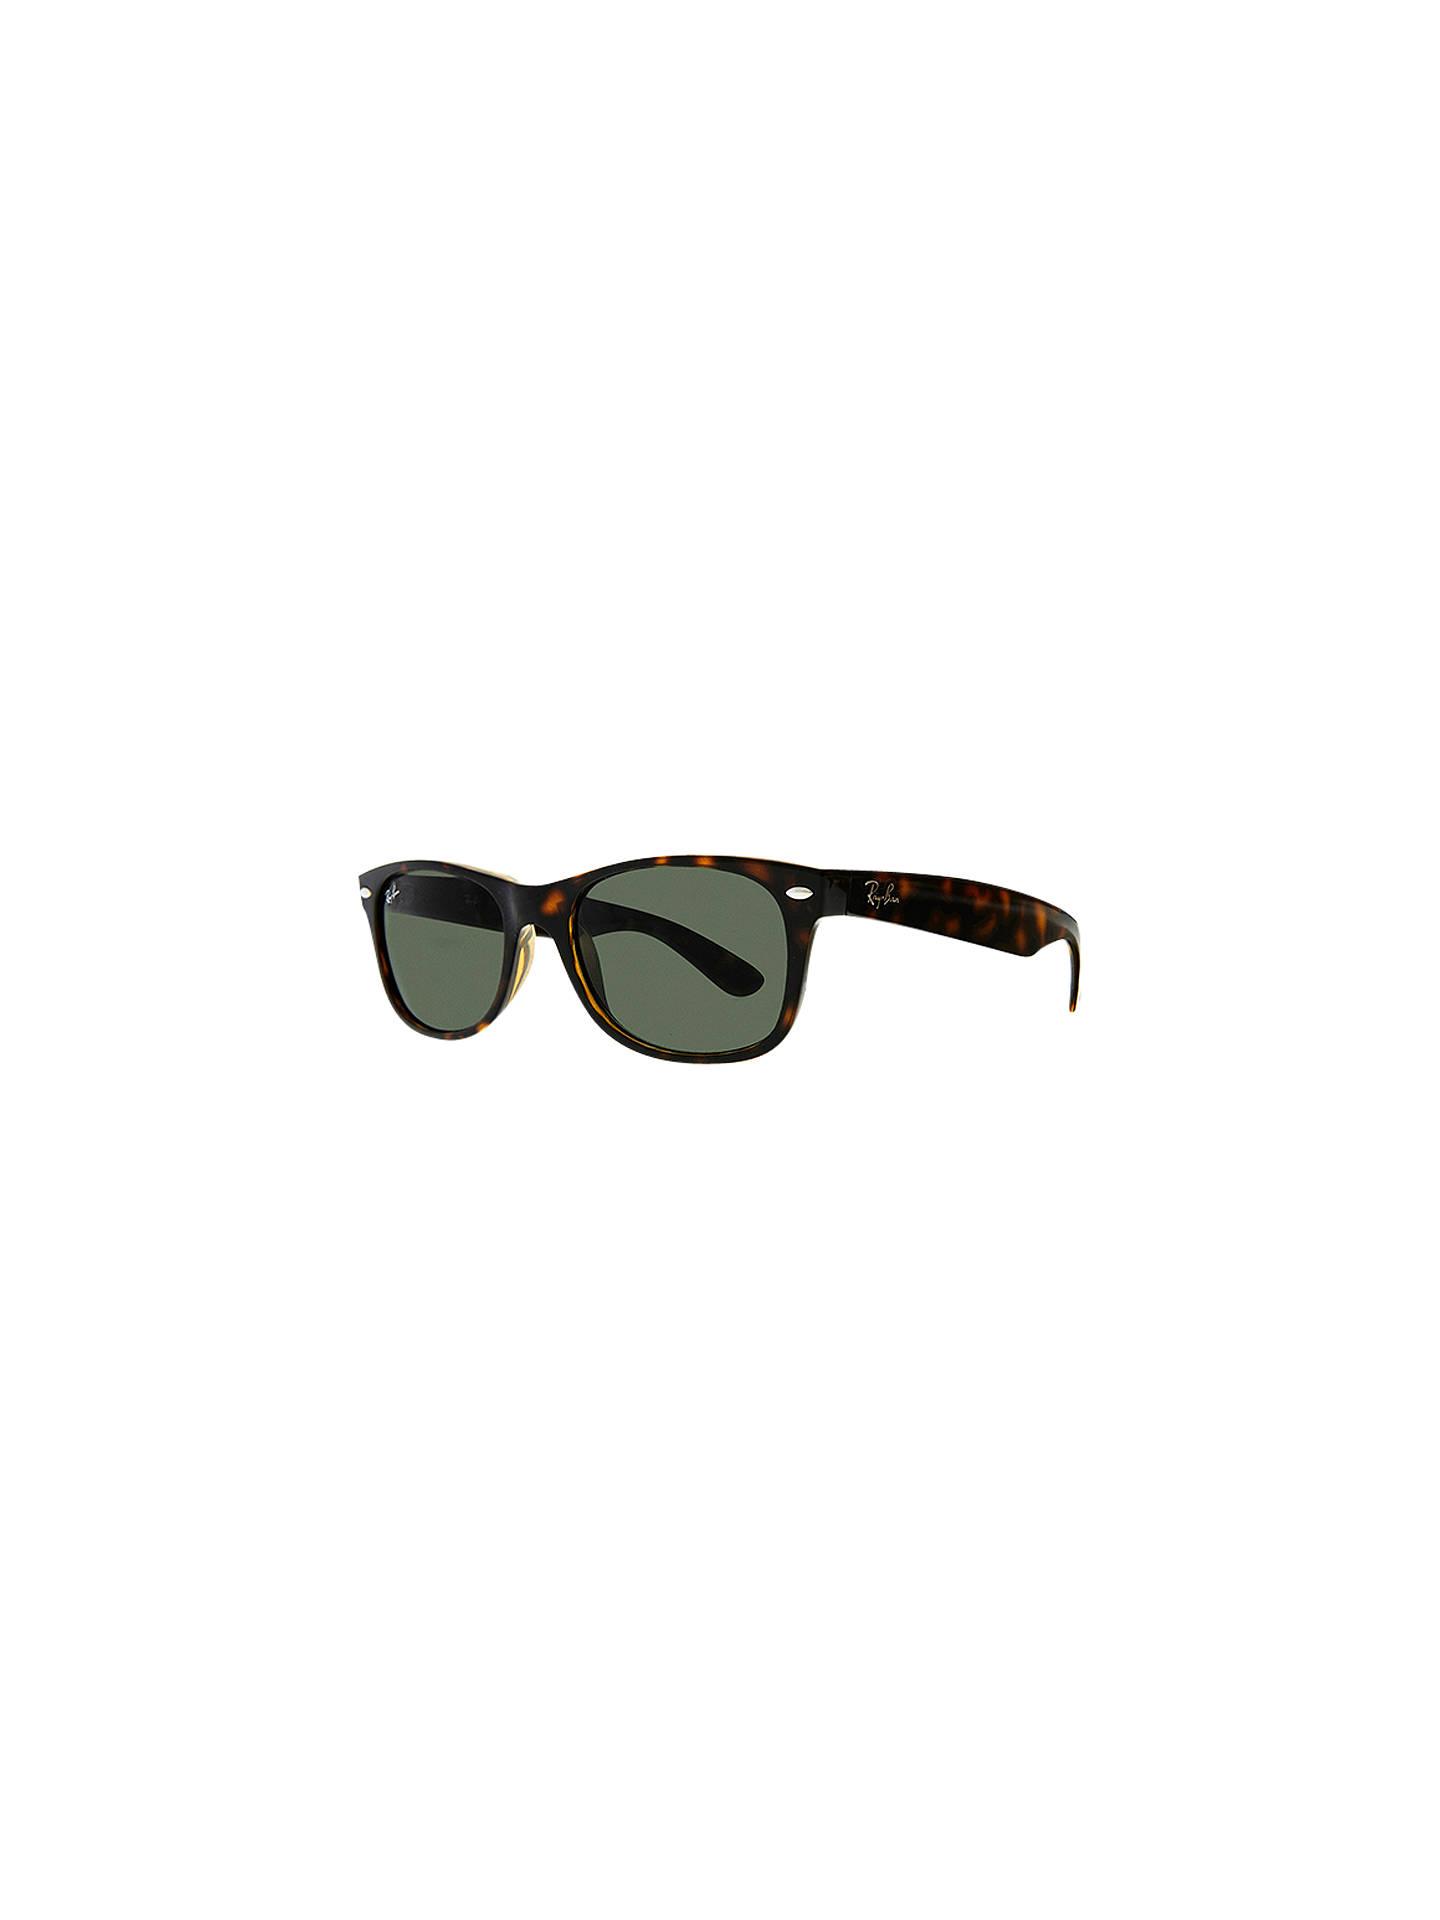 8653b96e29 Ray-Ban RB2132 New Wayfarer Oval Sunglasses at John Lewis   Partners